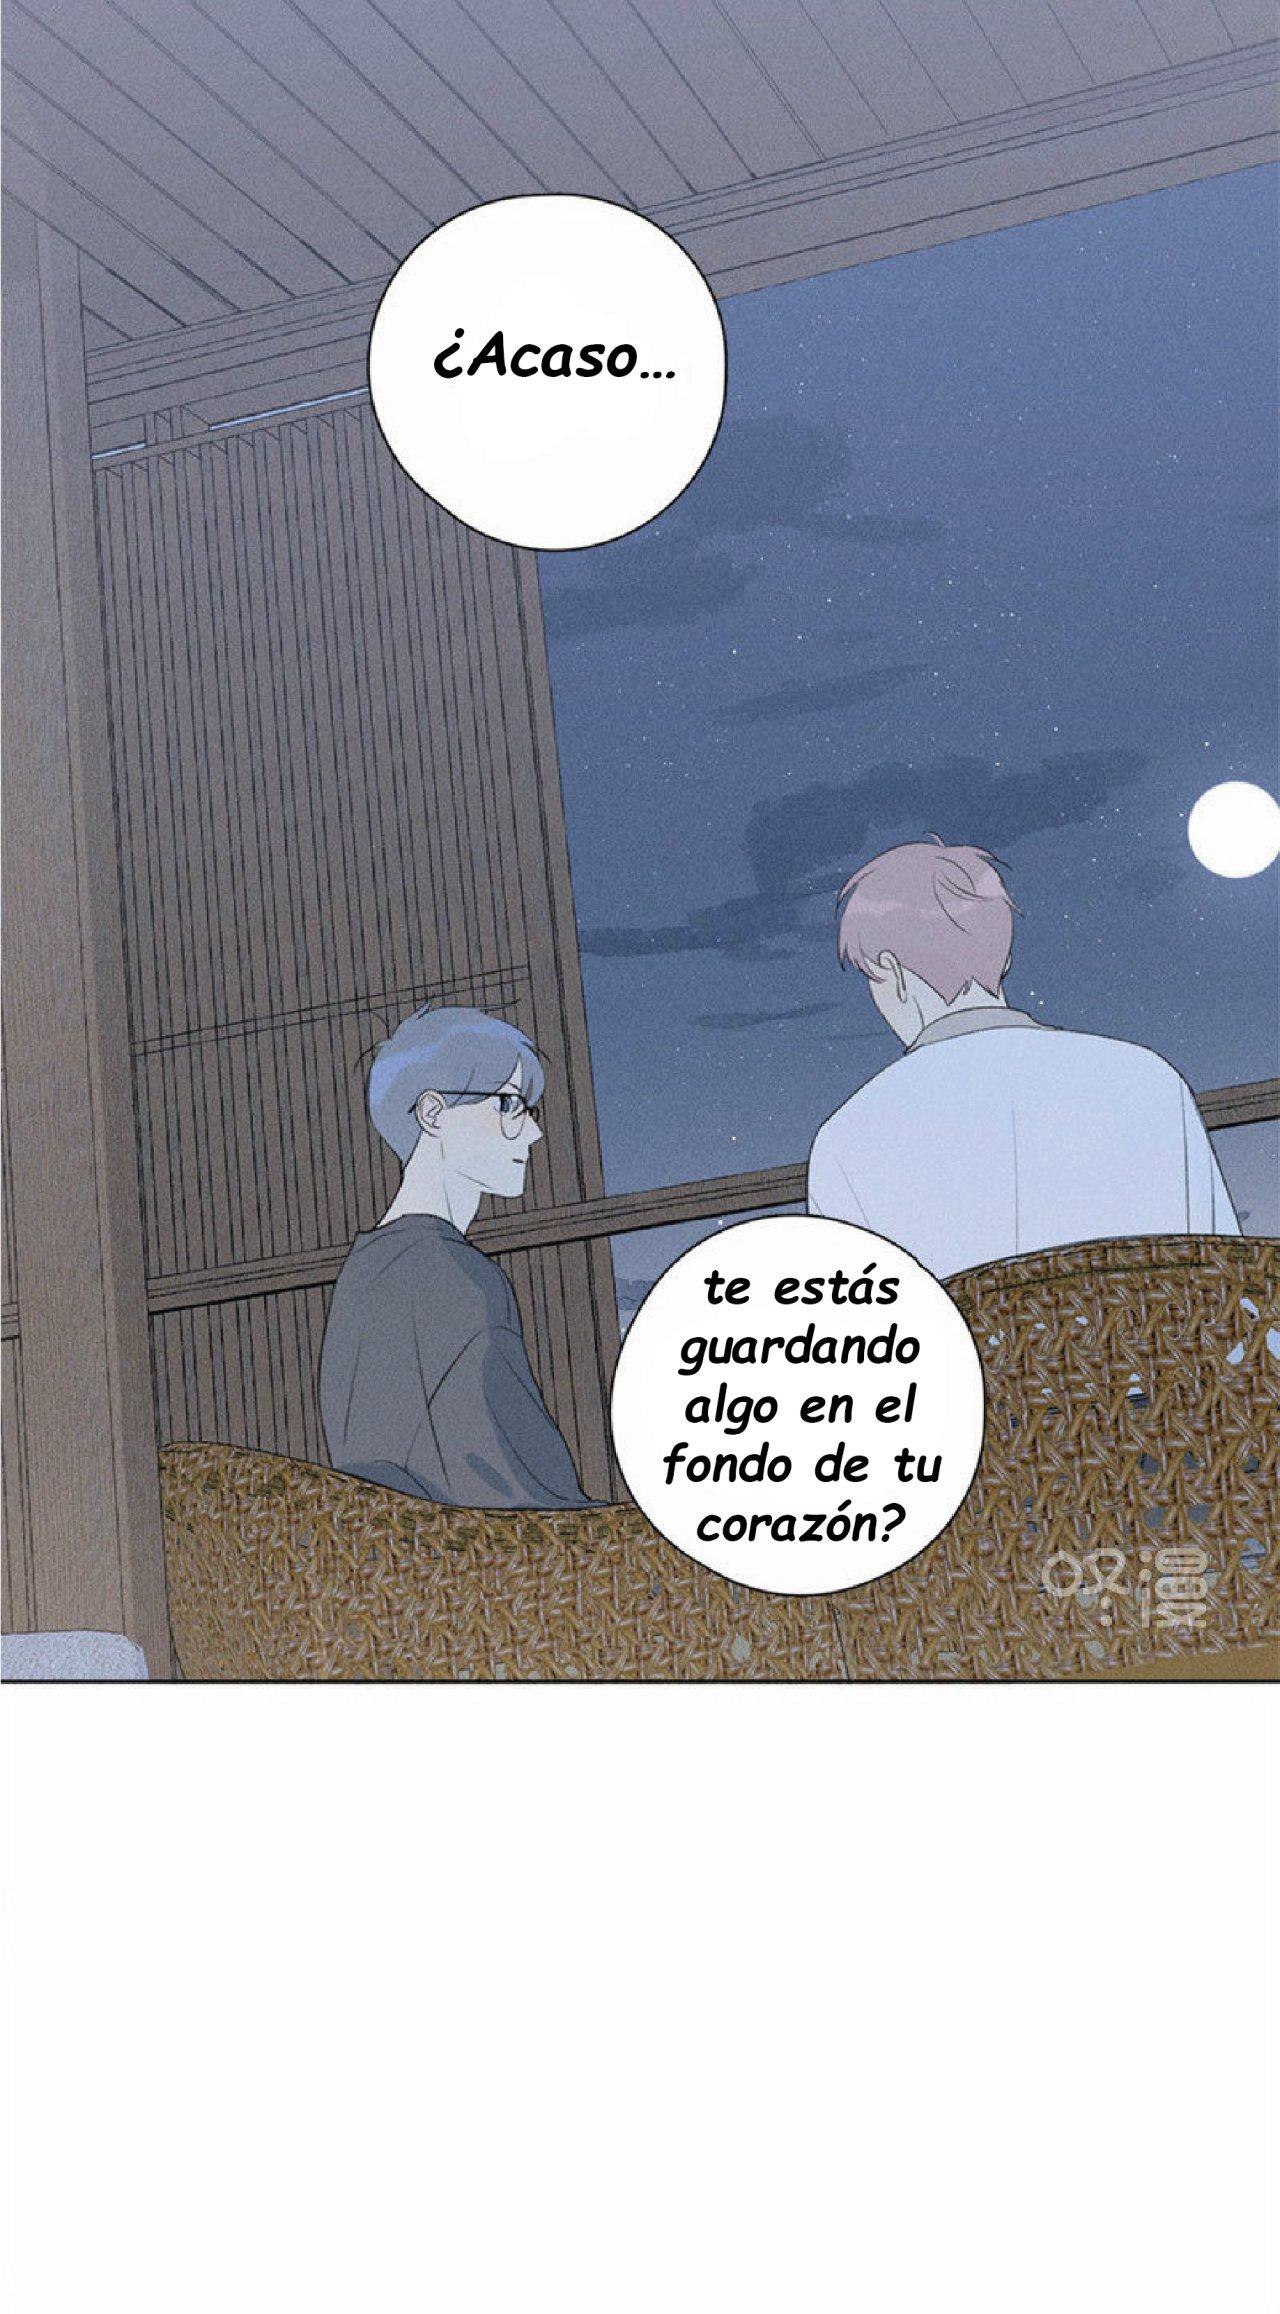 https://nine.mangadogs.com/es_manga/pic8/29/24925/957375/48a3c94a79d4a39e76bd4e5df6a521b5.jpg Page 33